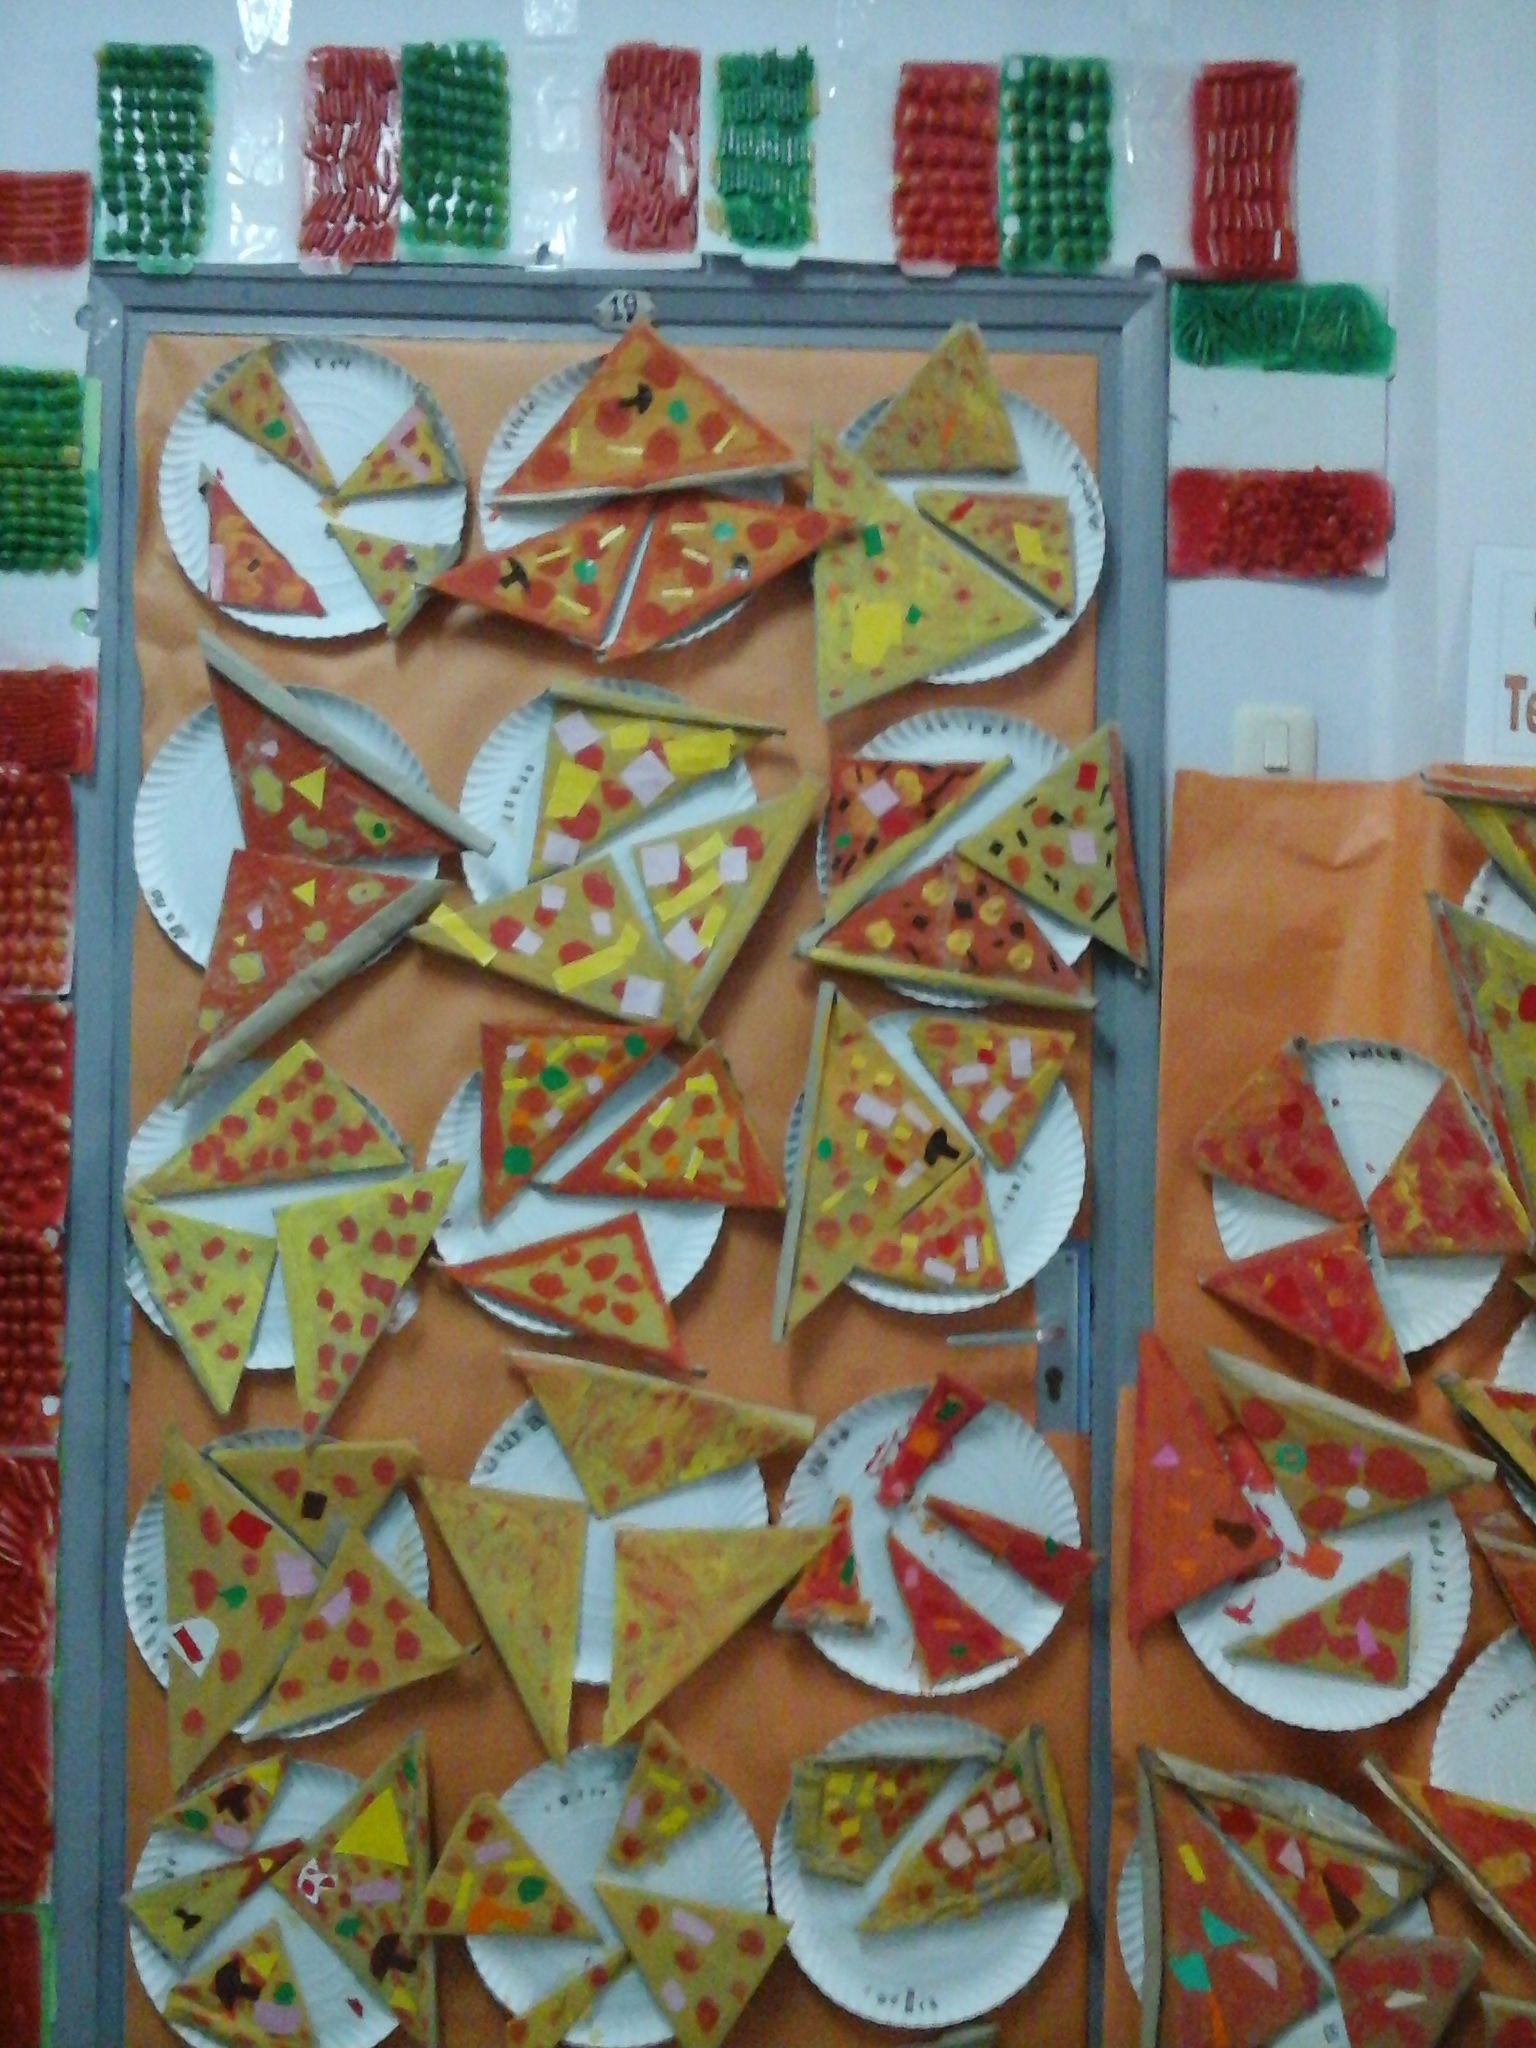 Italy display.